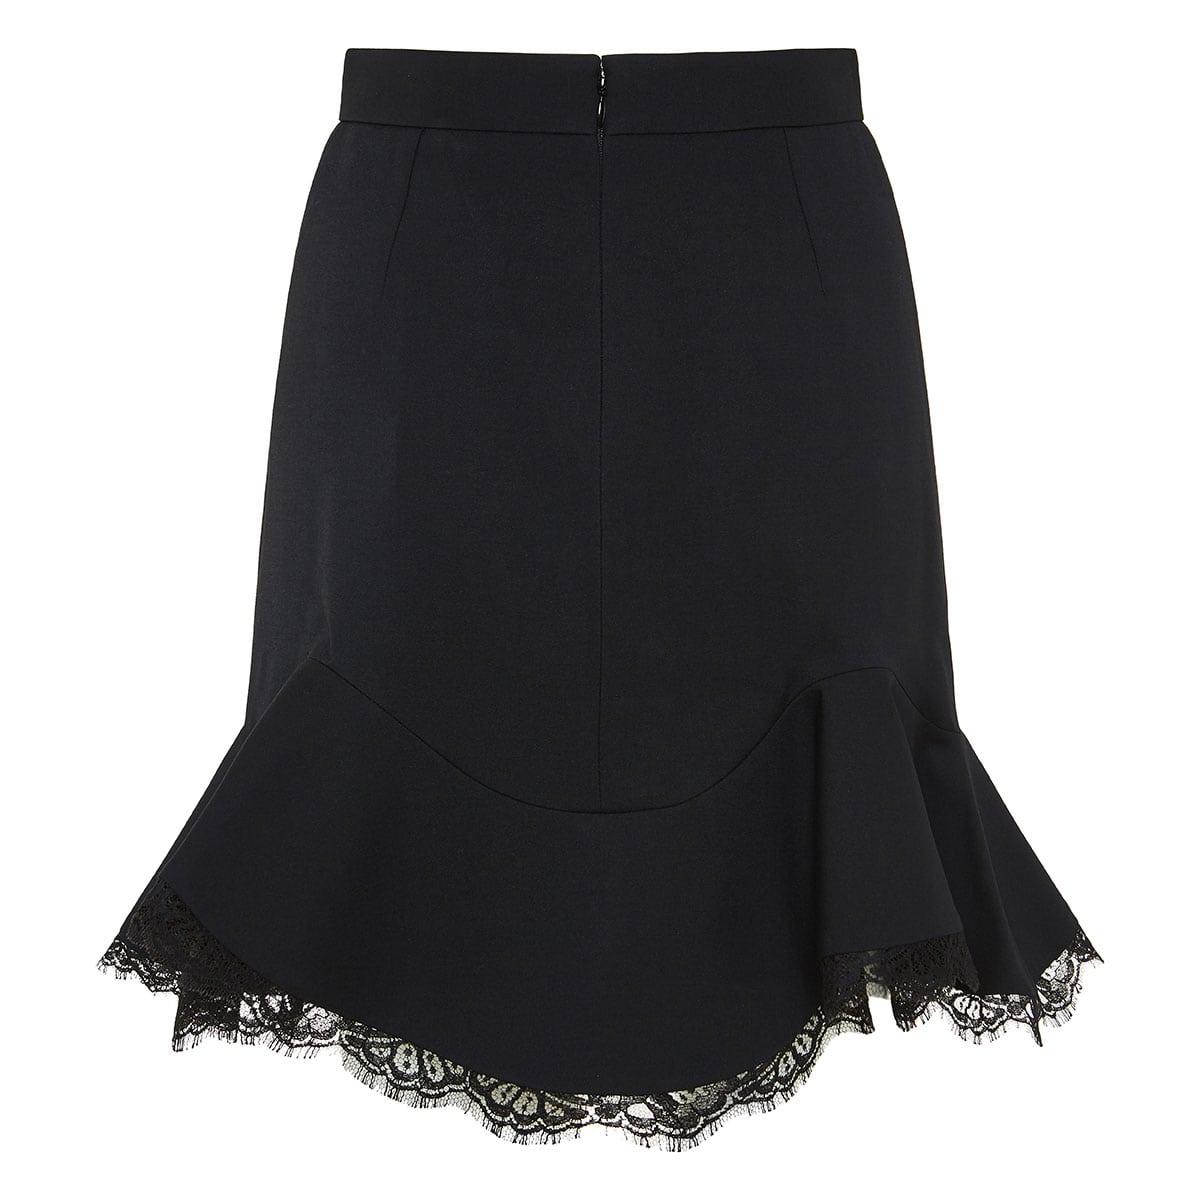 Lace-trimmed ruffled mini skirt